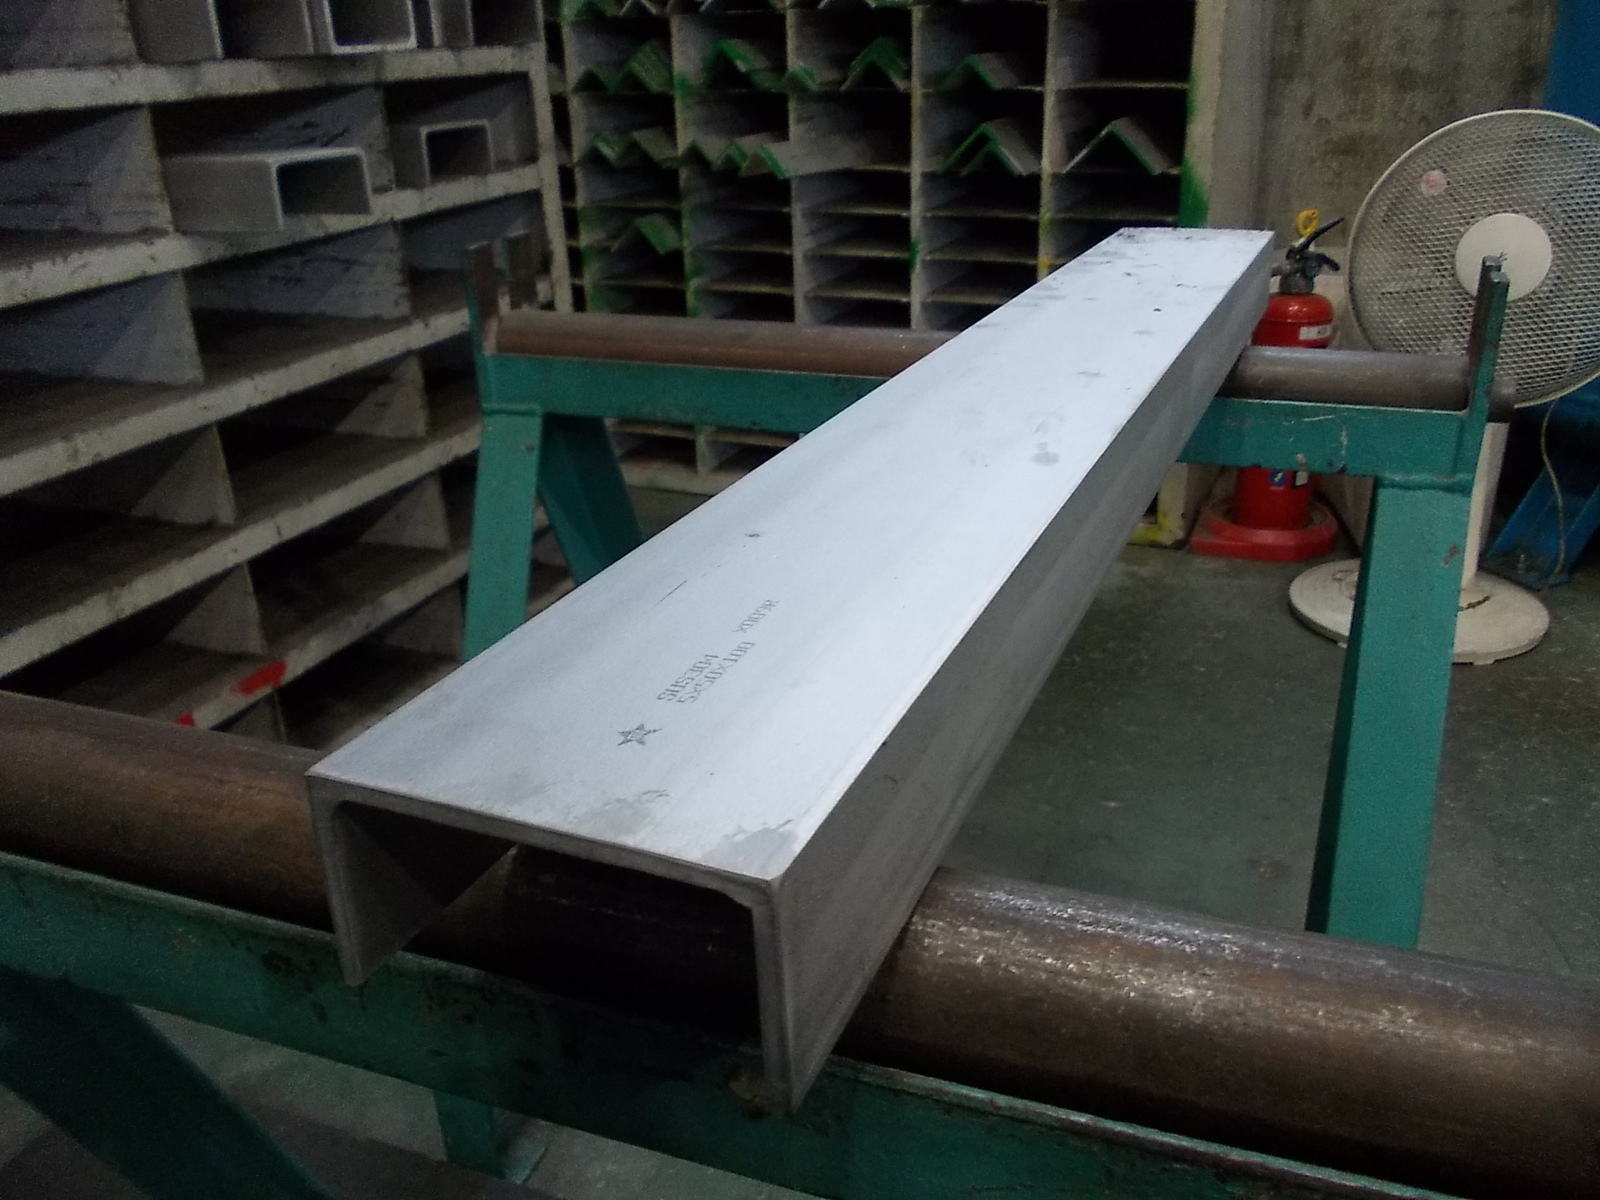 DIY 日曜大工 補修などに使用される ステンレスの代表的 一般鋼種 SUS 304 新品未使用 6x75x150x75x300 出色 ステンレス チャンネル